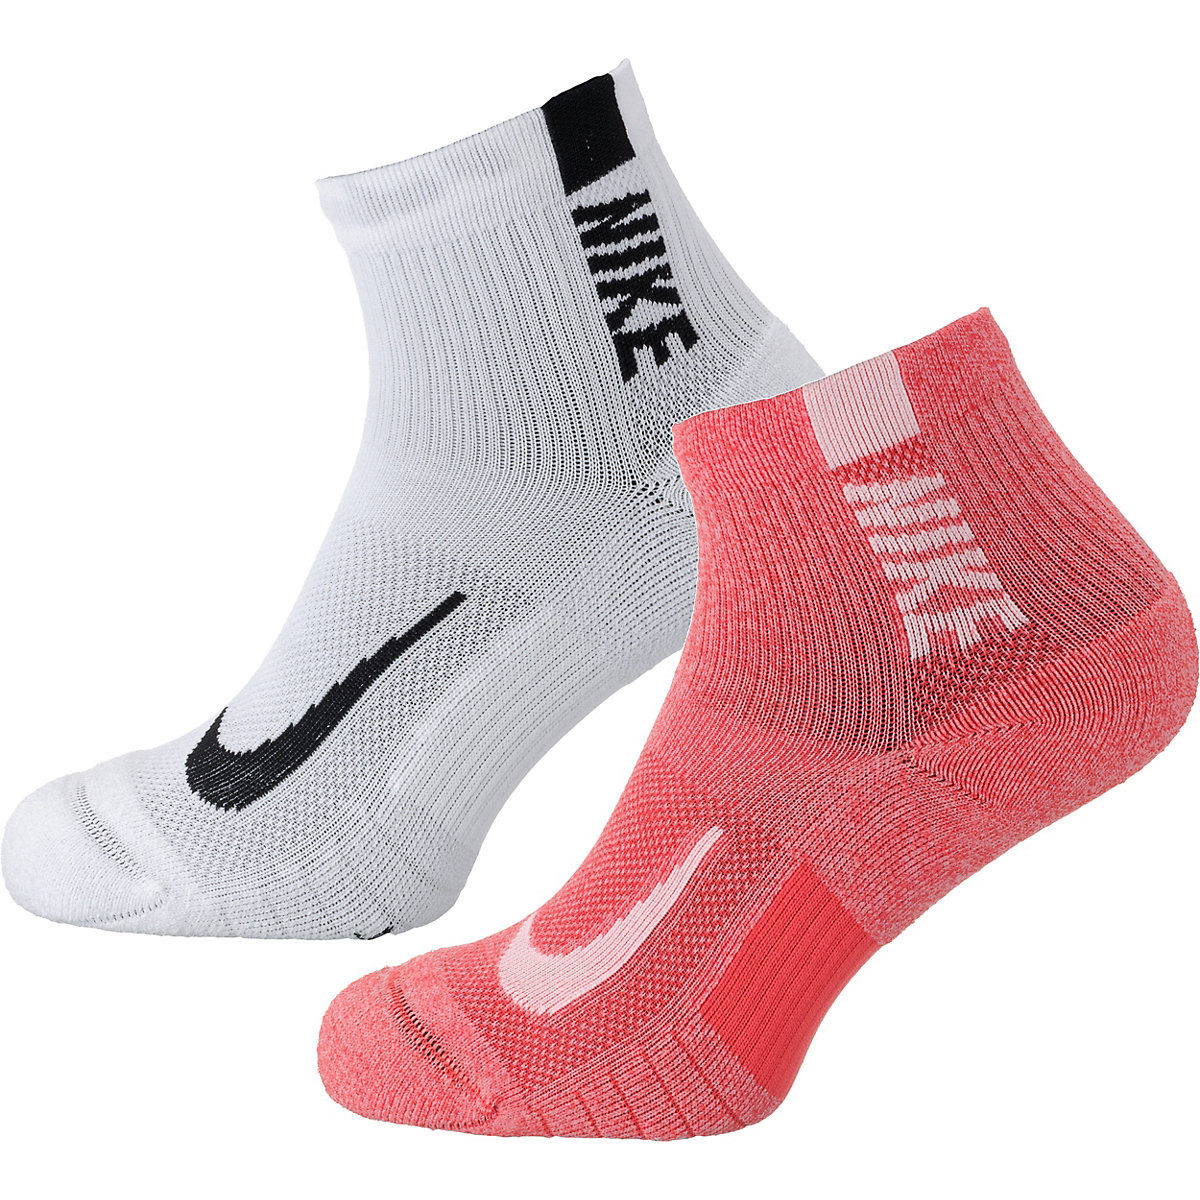 Weiße Nike Socken